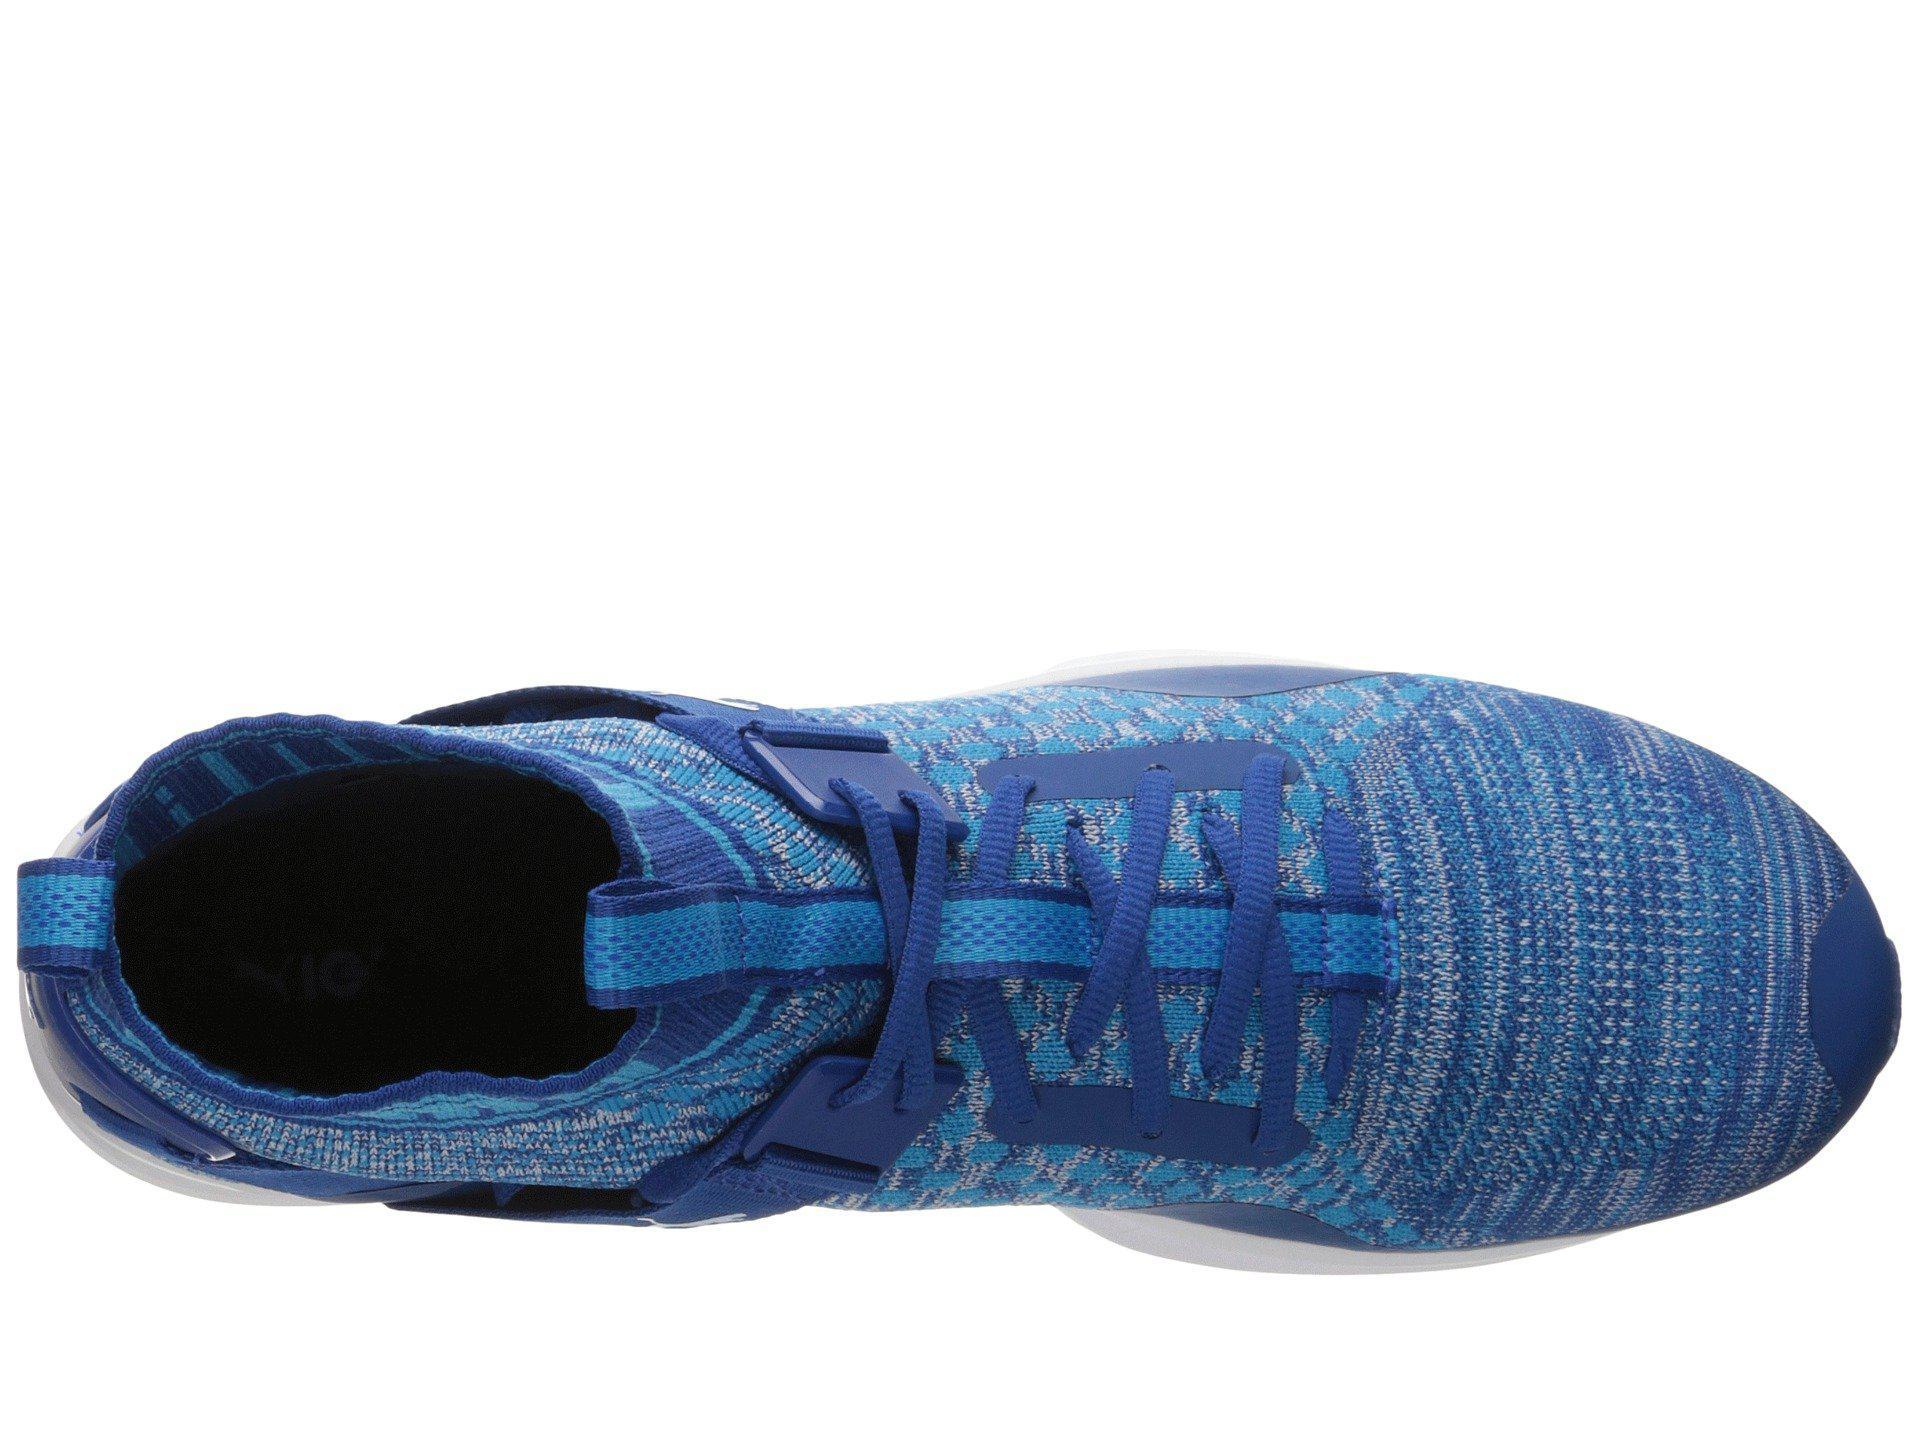 cb2a567fb8b4 Lyst - PUMA Ignite Evoknit in Blue for Men - Save 23.07692307692308%